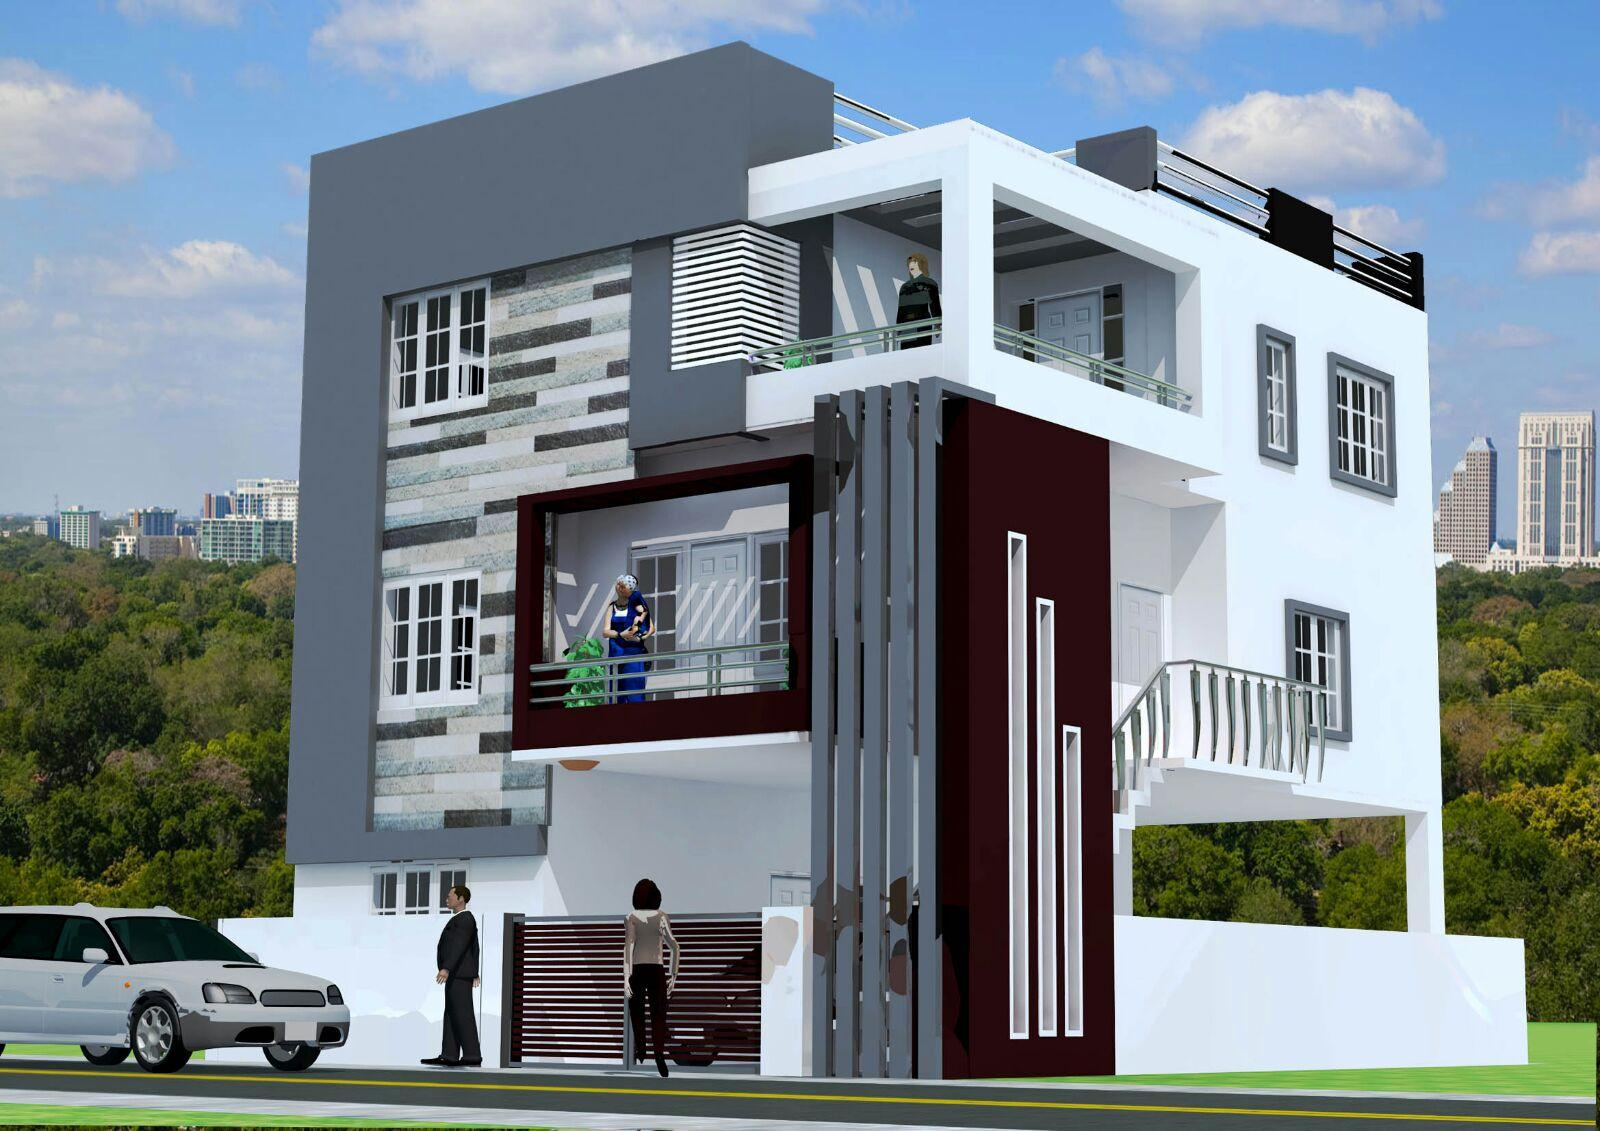 Commercial Front Elevation Designs : Commercial building gharexpert